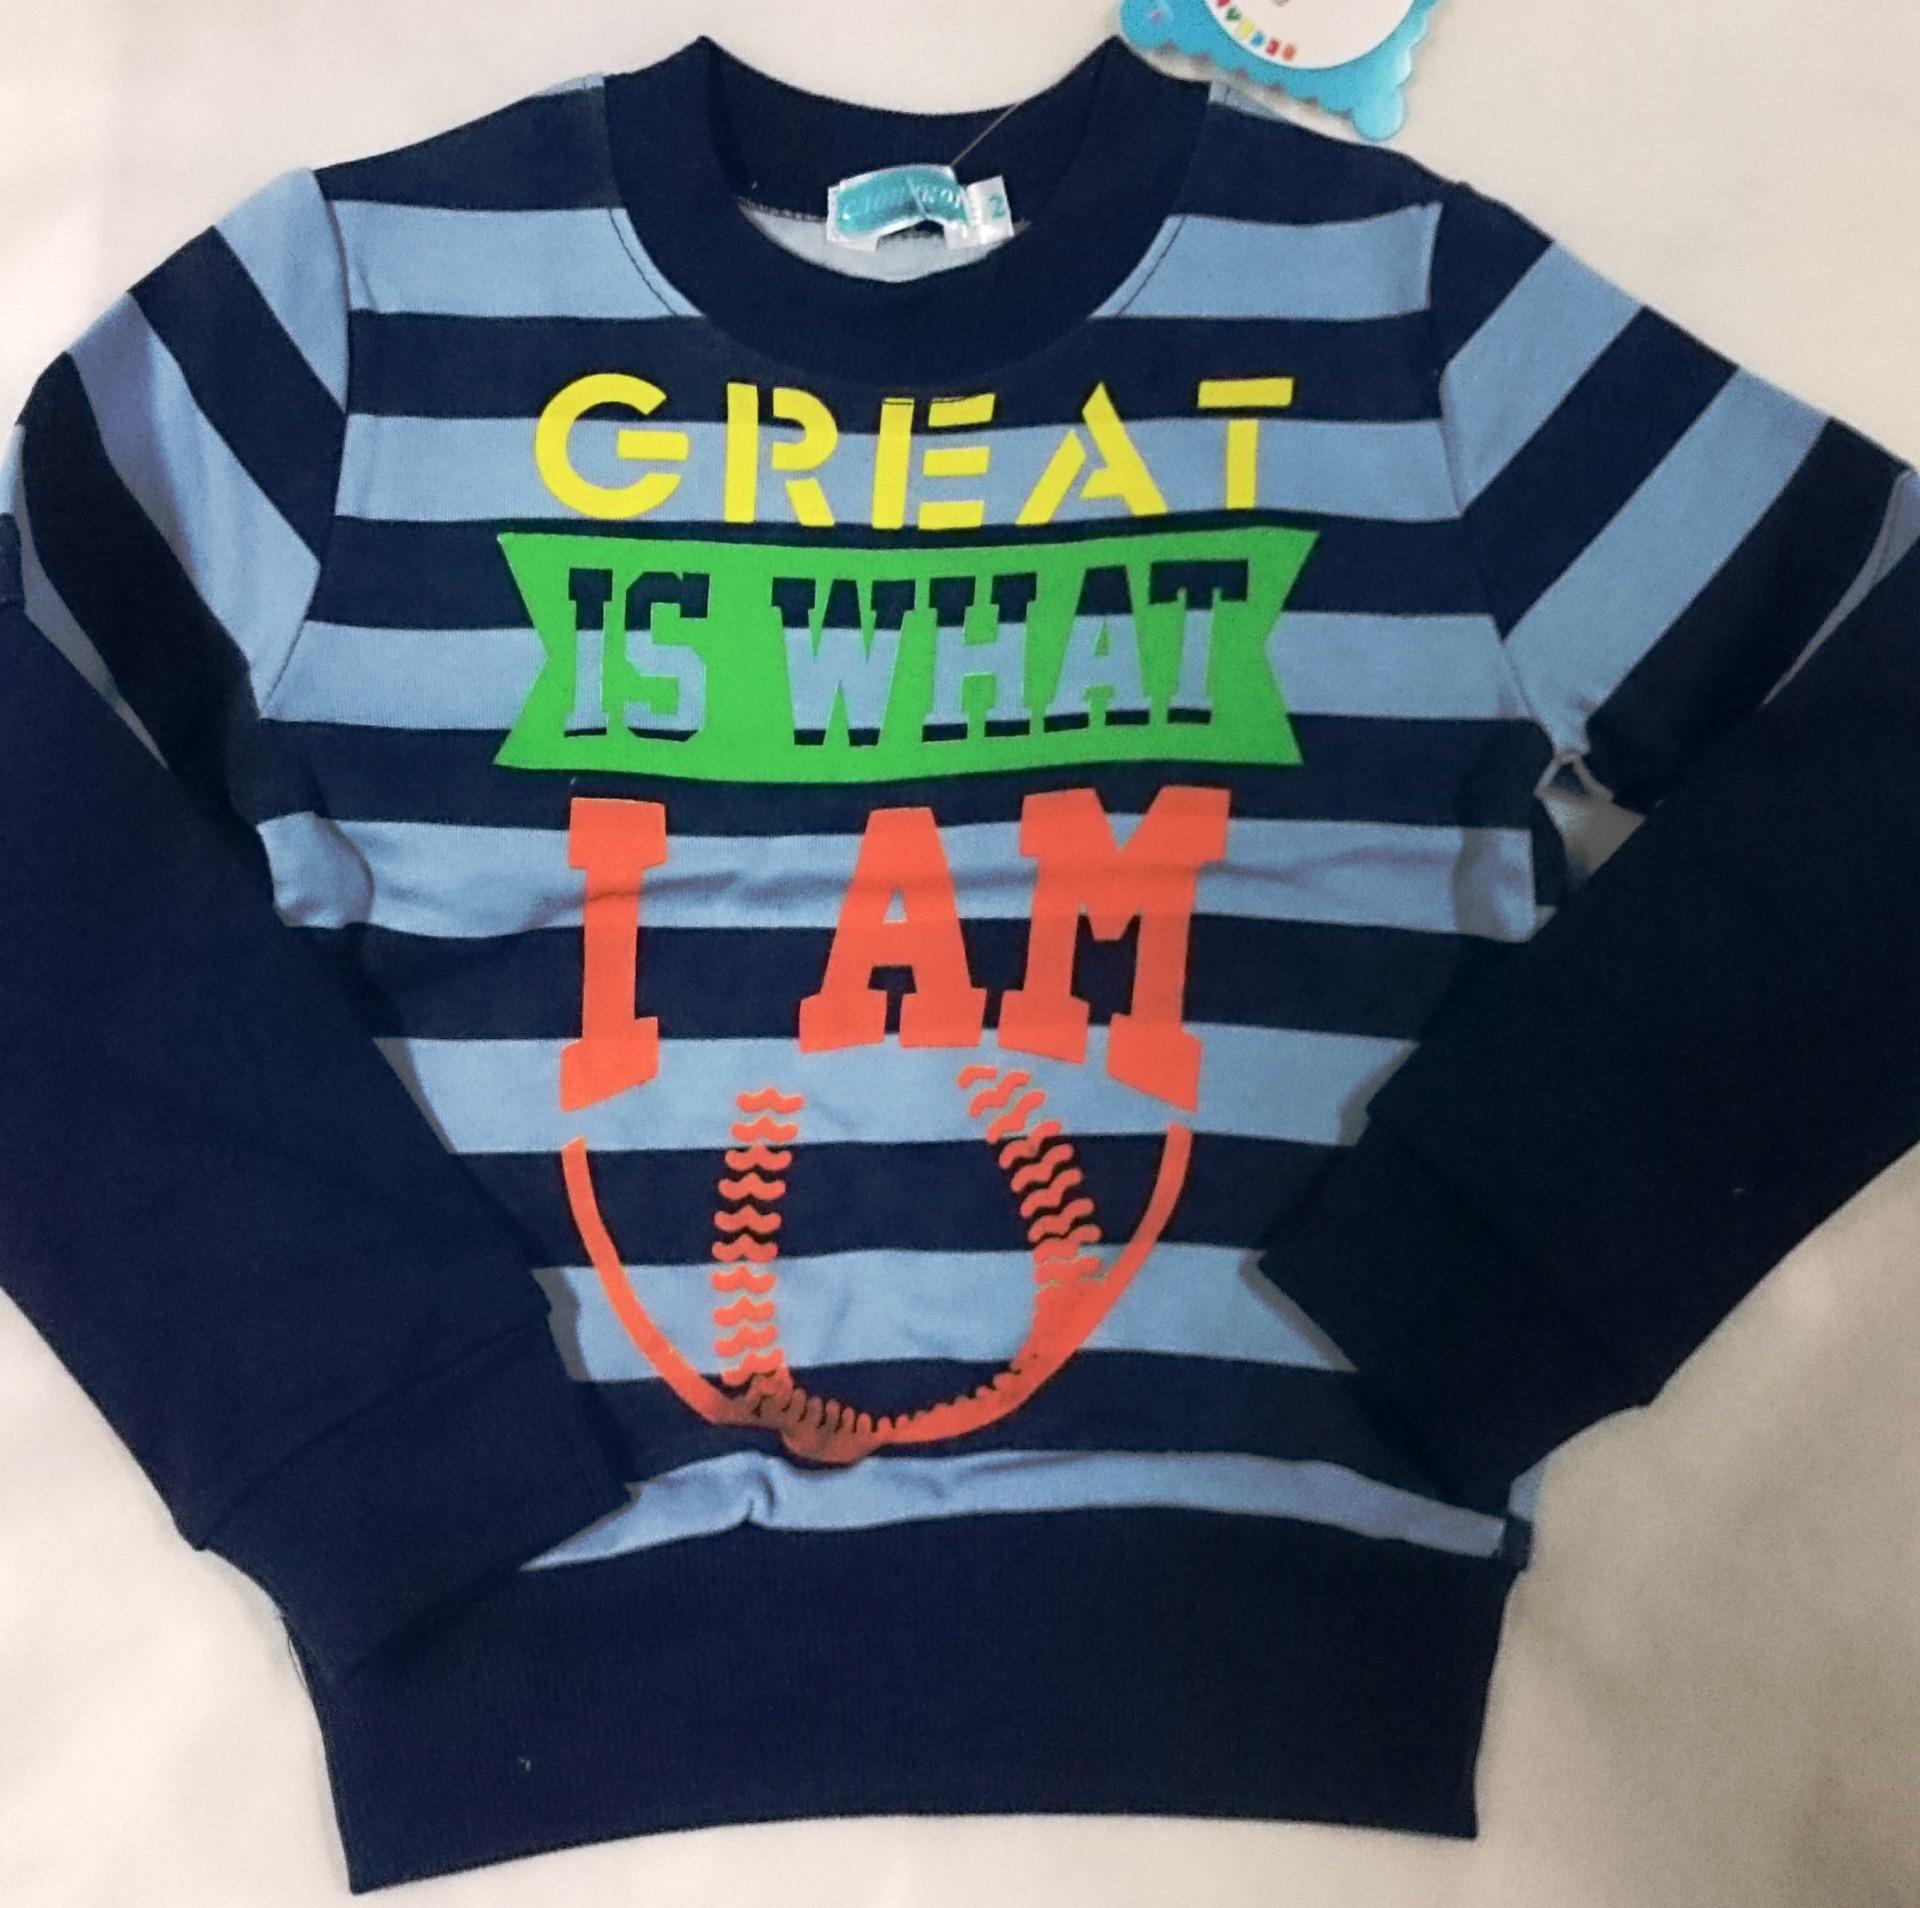 Детская Одежда Производство Узбекистан Оптом